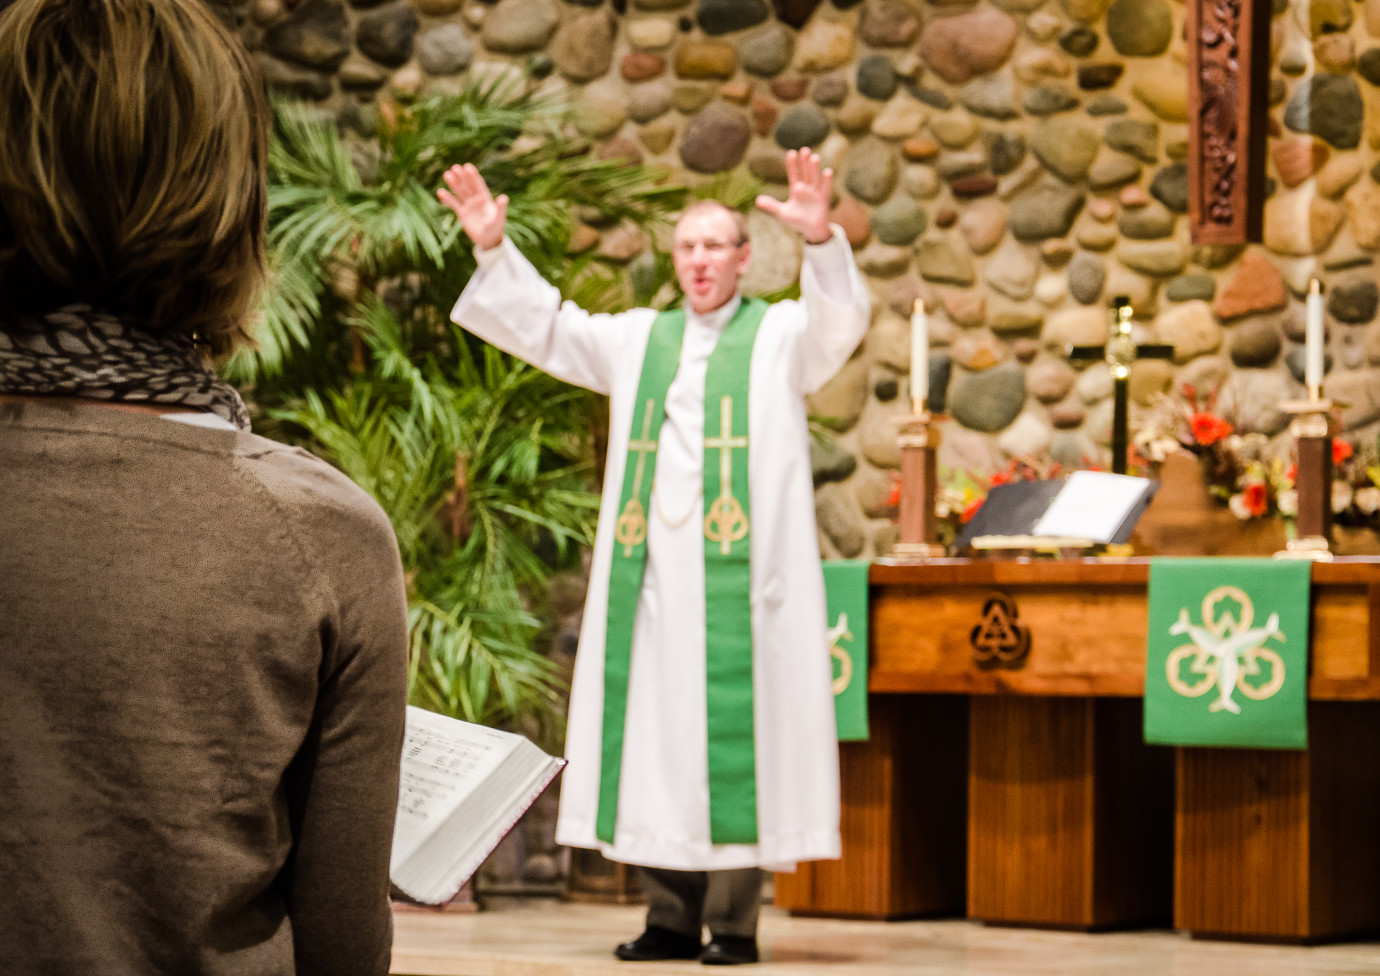 Wednesday Weekly Worship 7:00 pm